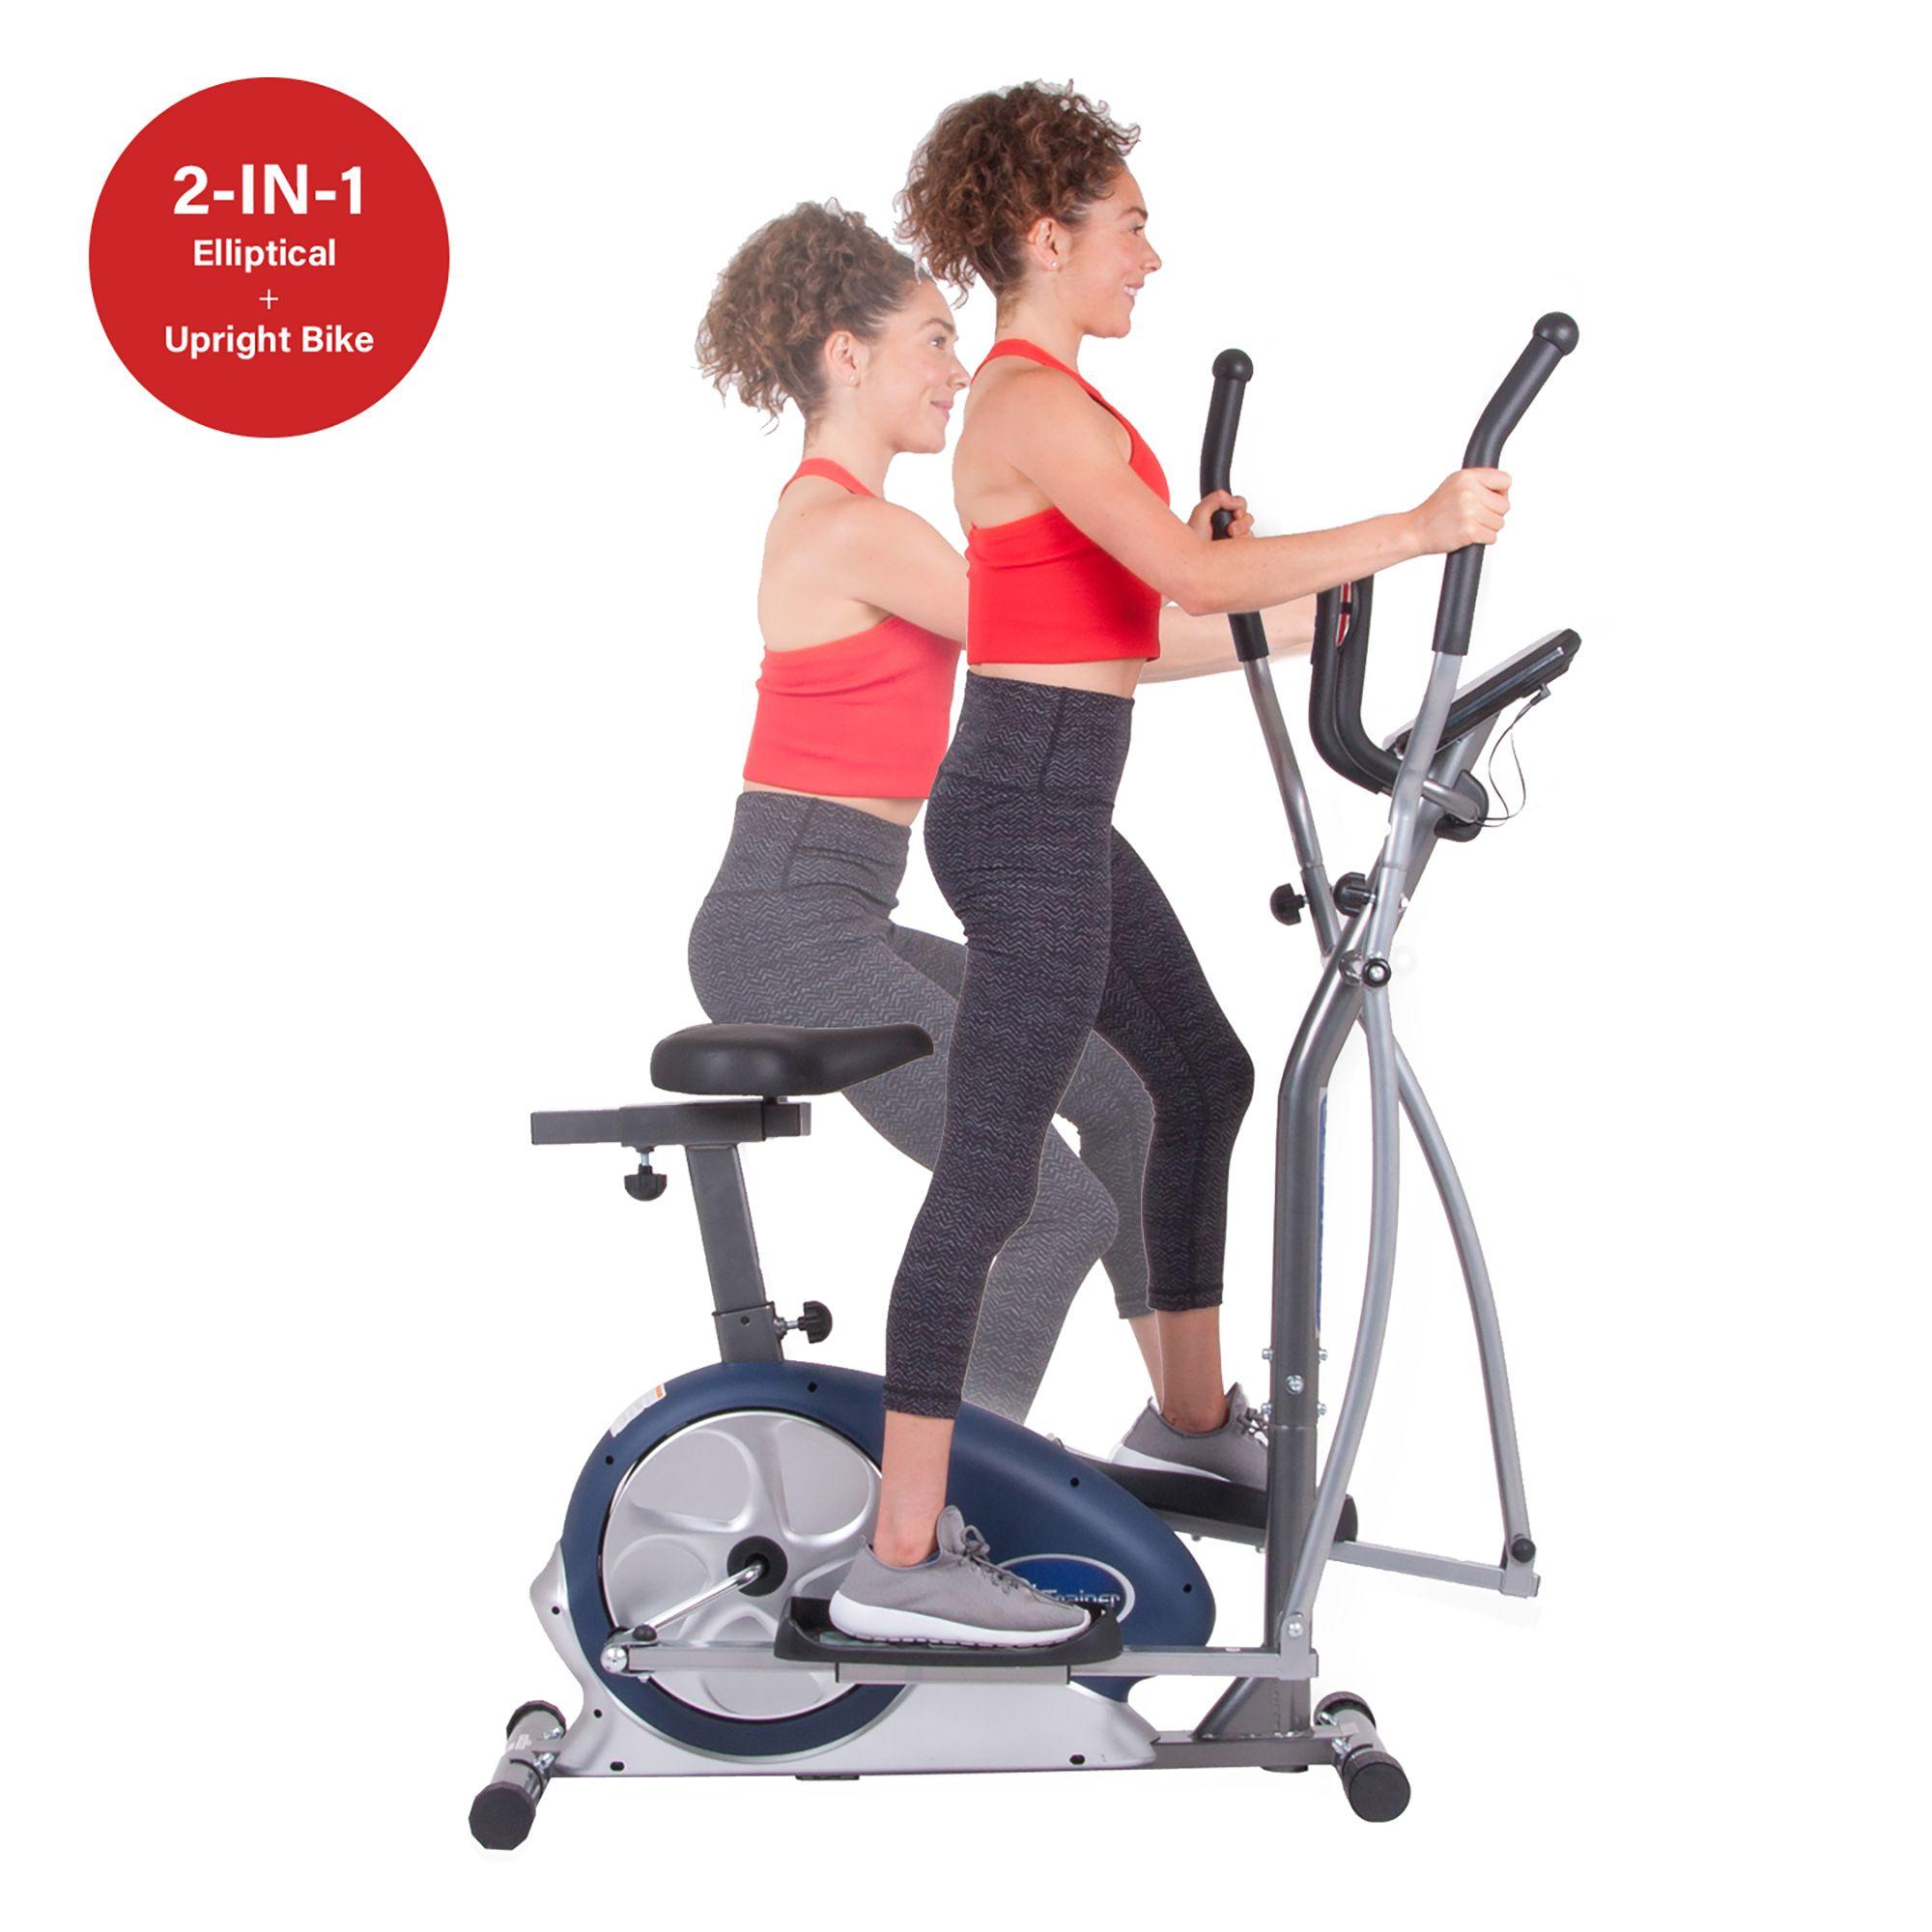 Body Champ Brm3671 Cardio Dual Trainer Silver Blue Elliptical Trainer Elliptical Workout